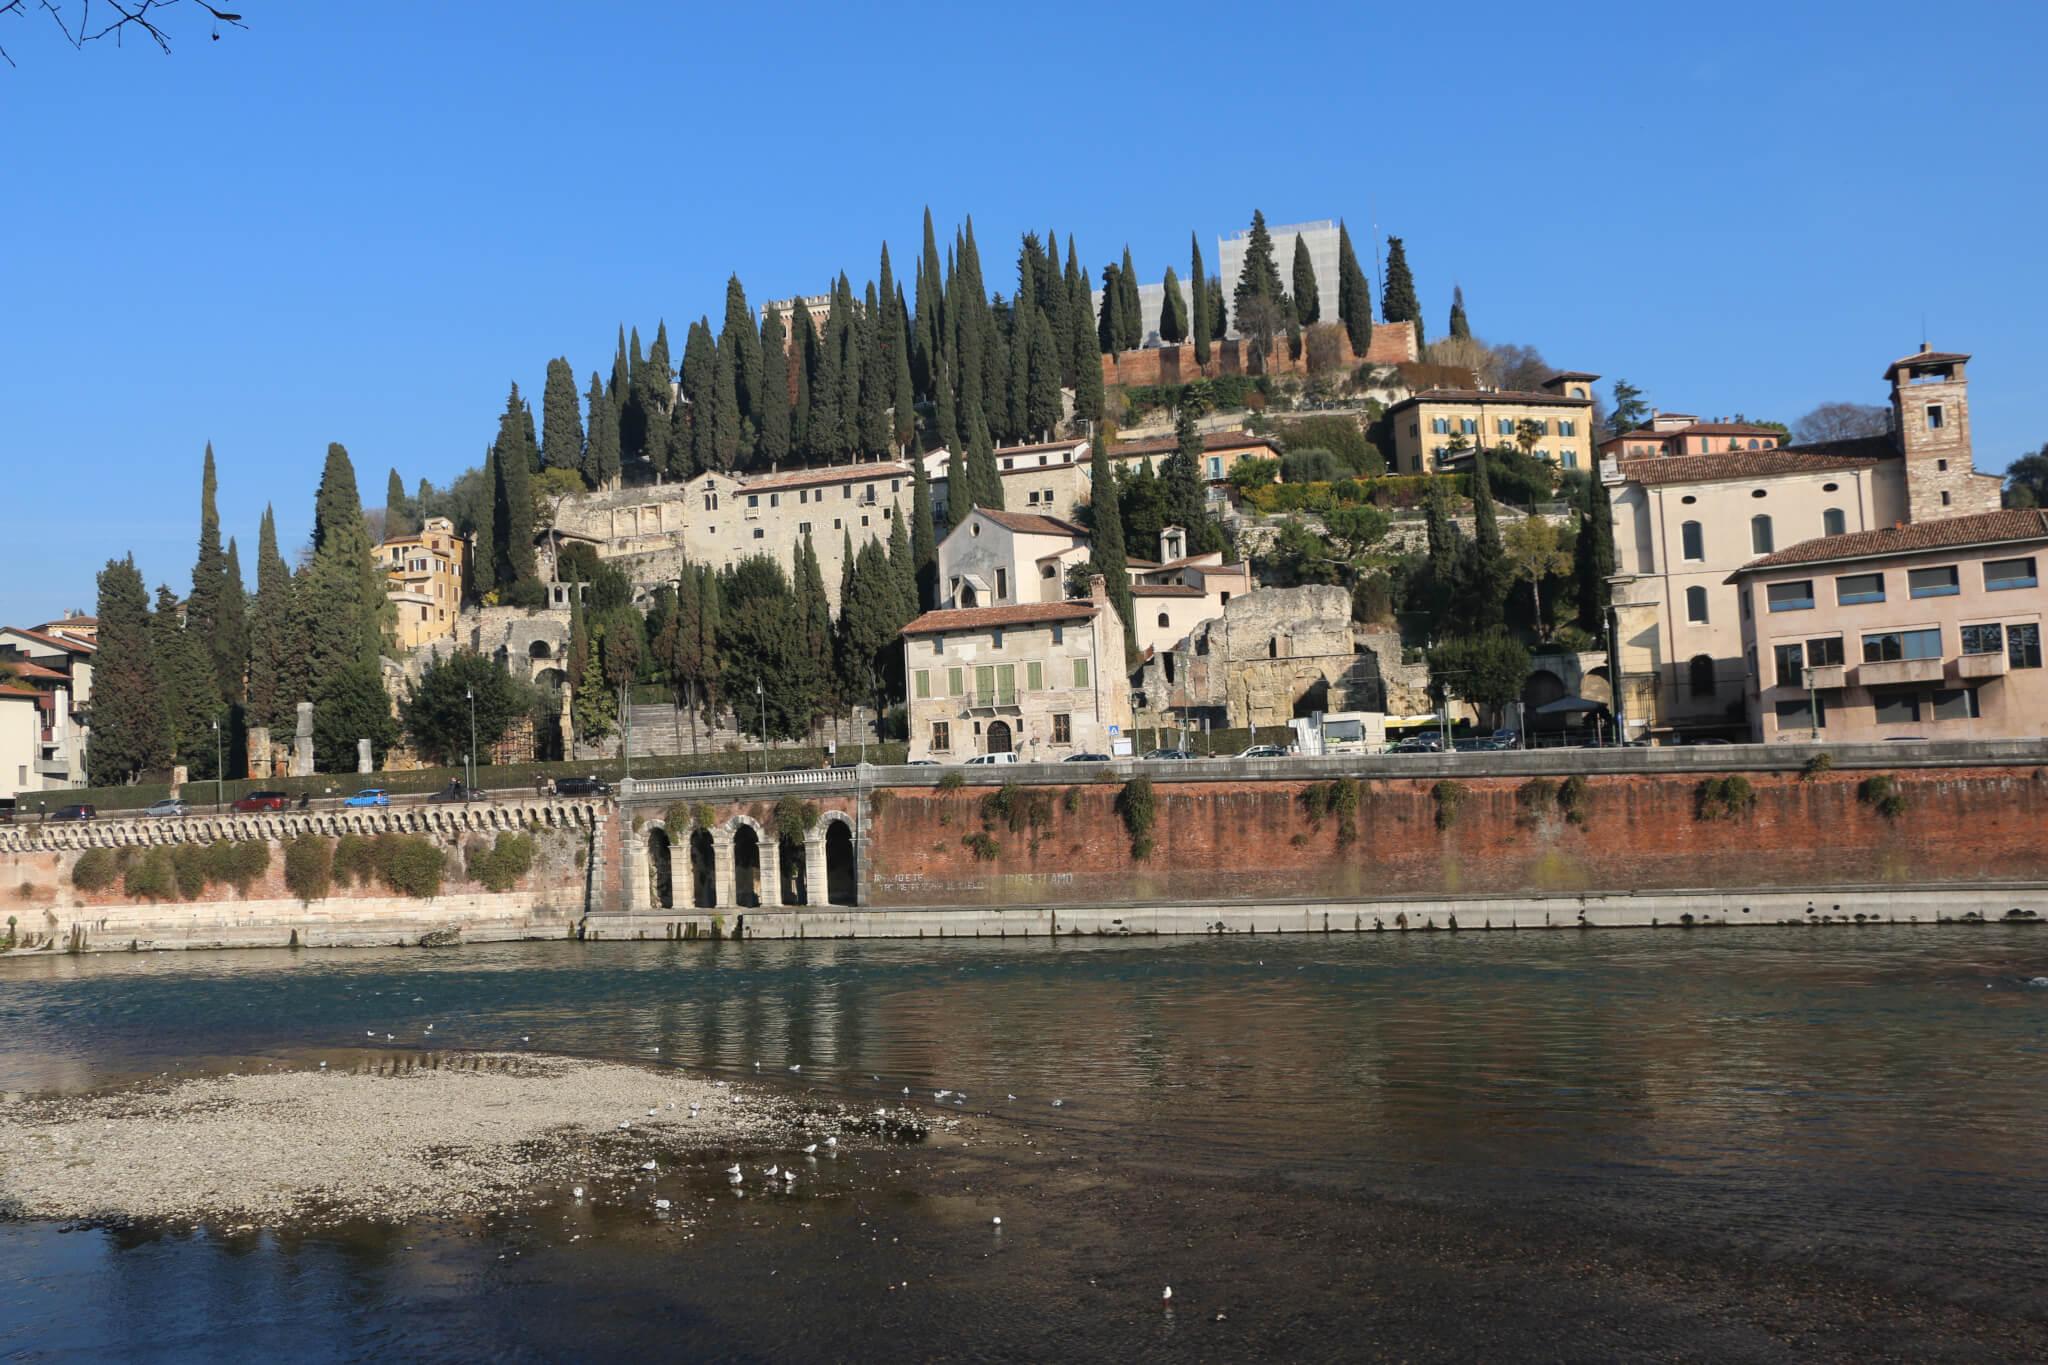 Adige, Verona